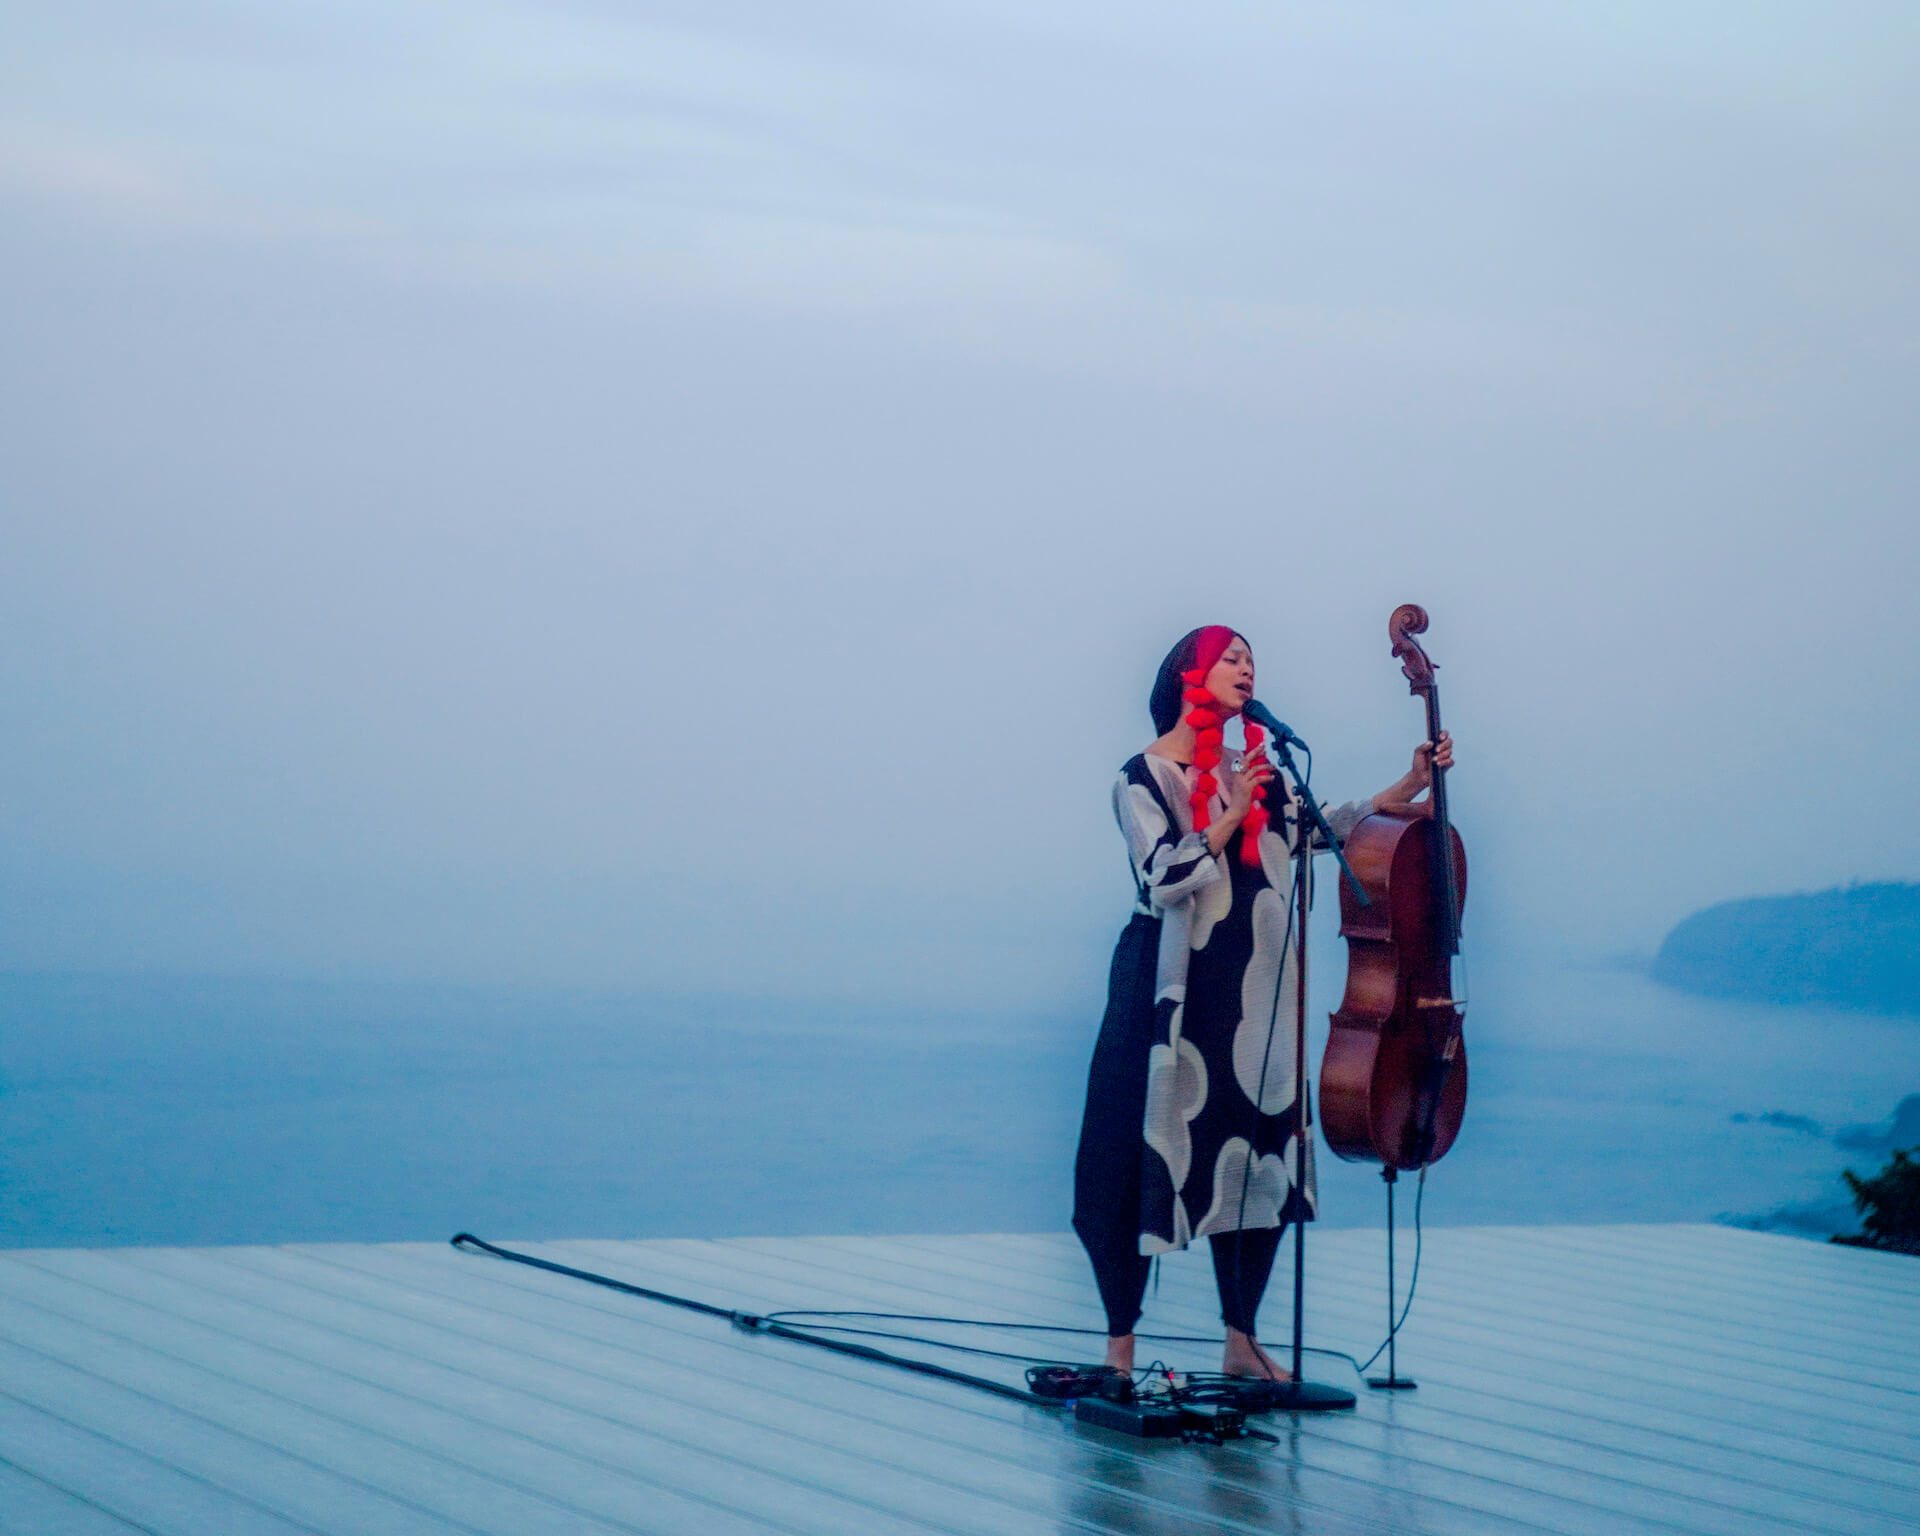 Kelsey Lu ライヴ・レポート 小田原文化財団/江之浦測候所で日没に向かうたった50分の間に見せた奇跡 music190529-kelsey-lu-report-4